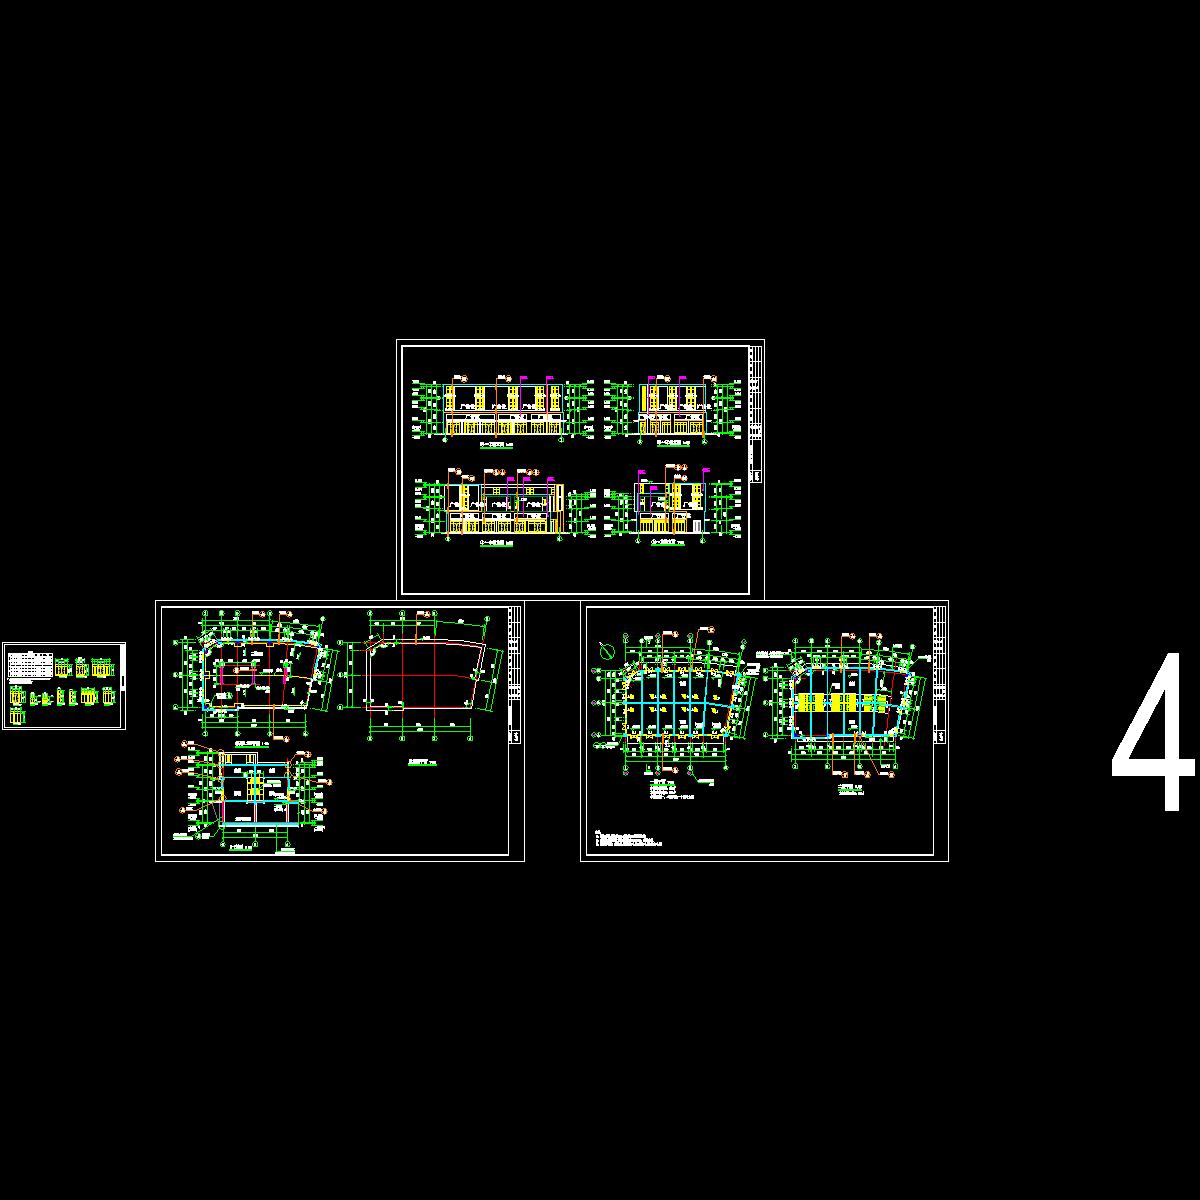 e1-4_t3.dwg